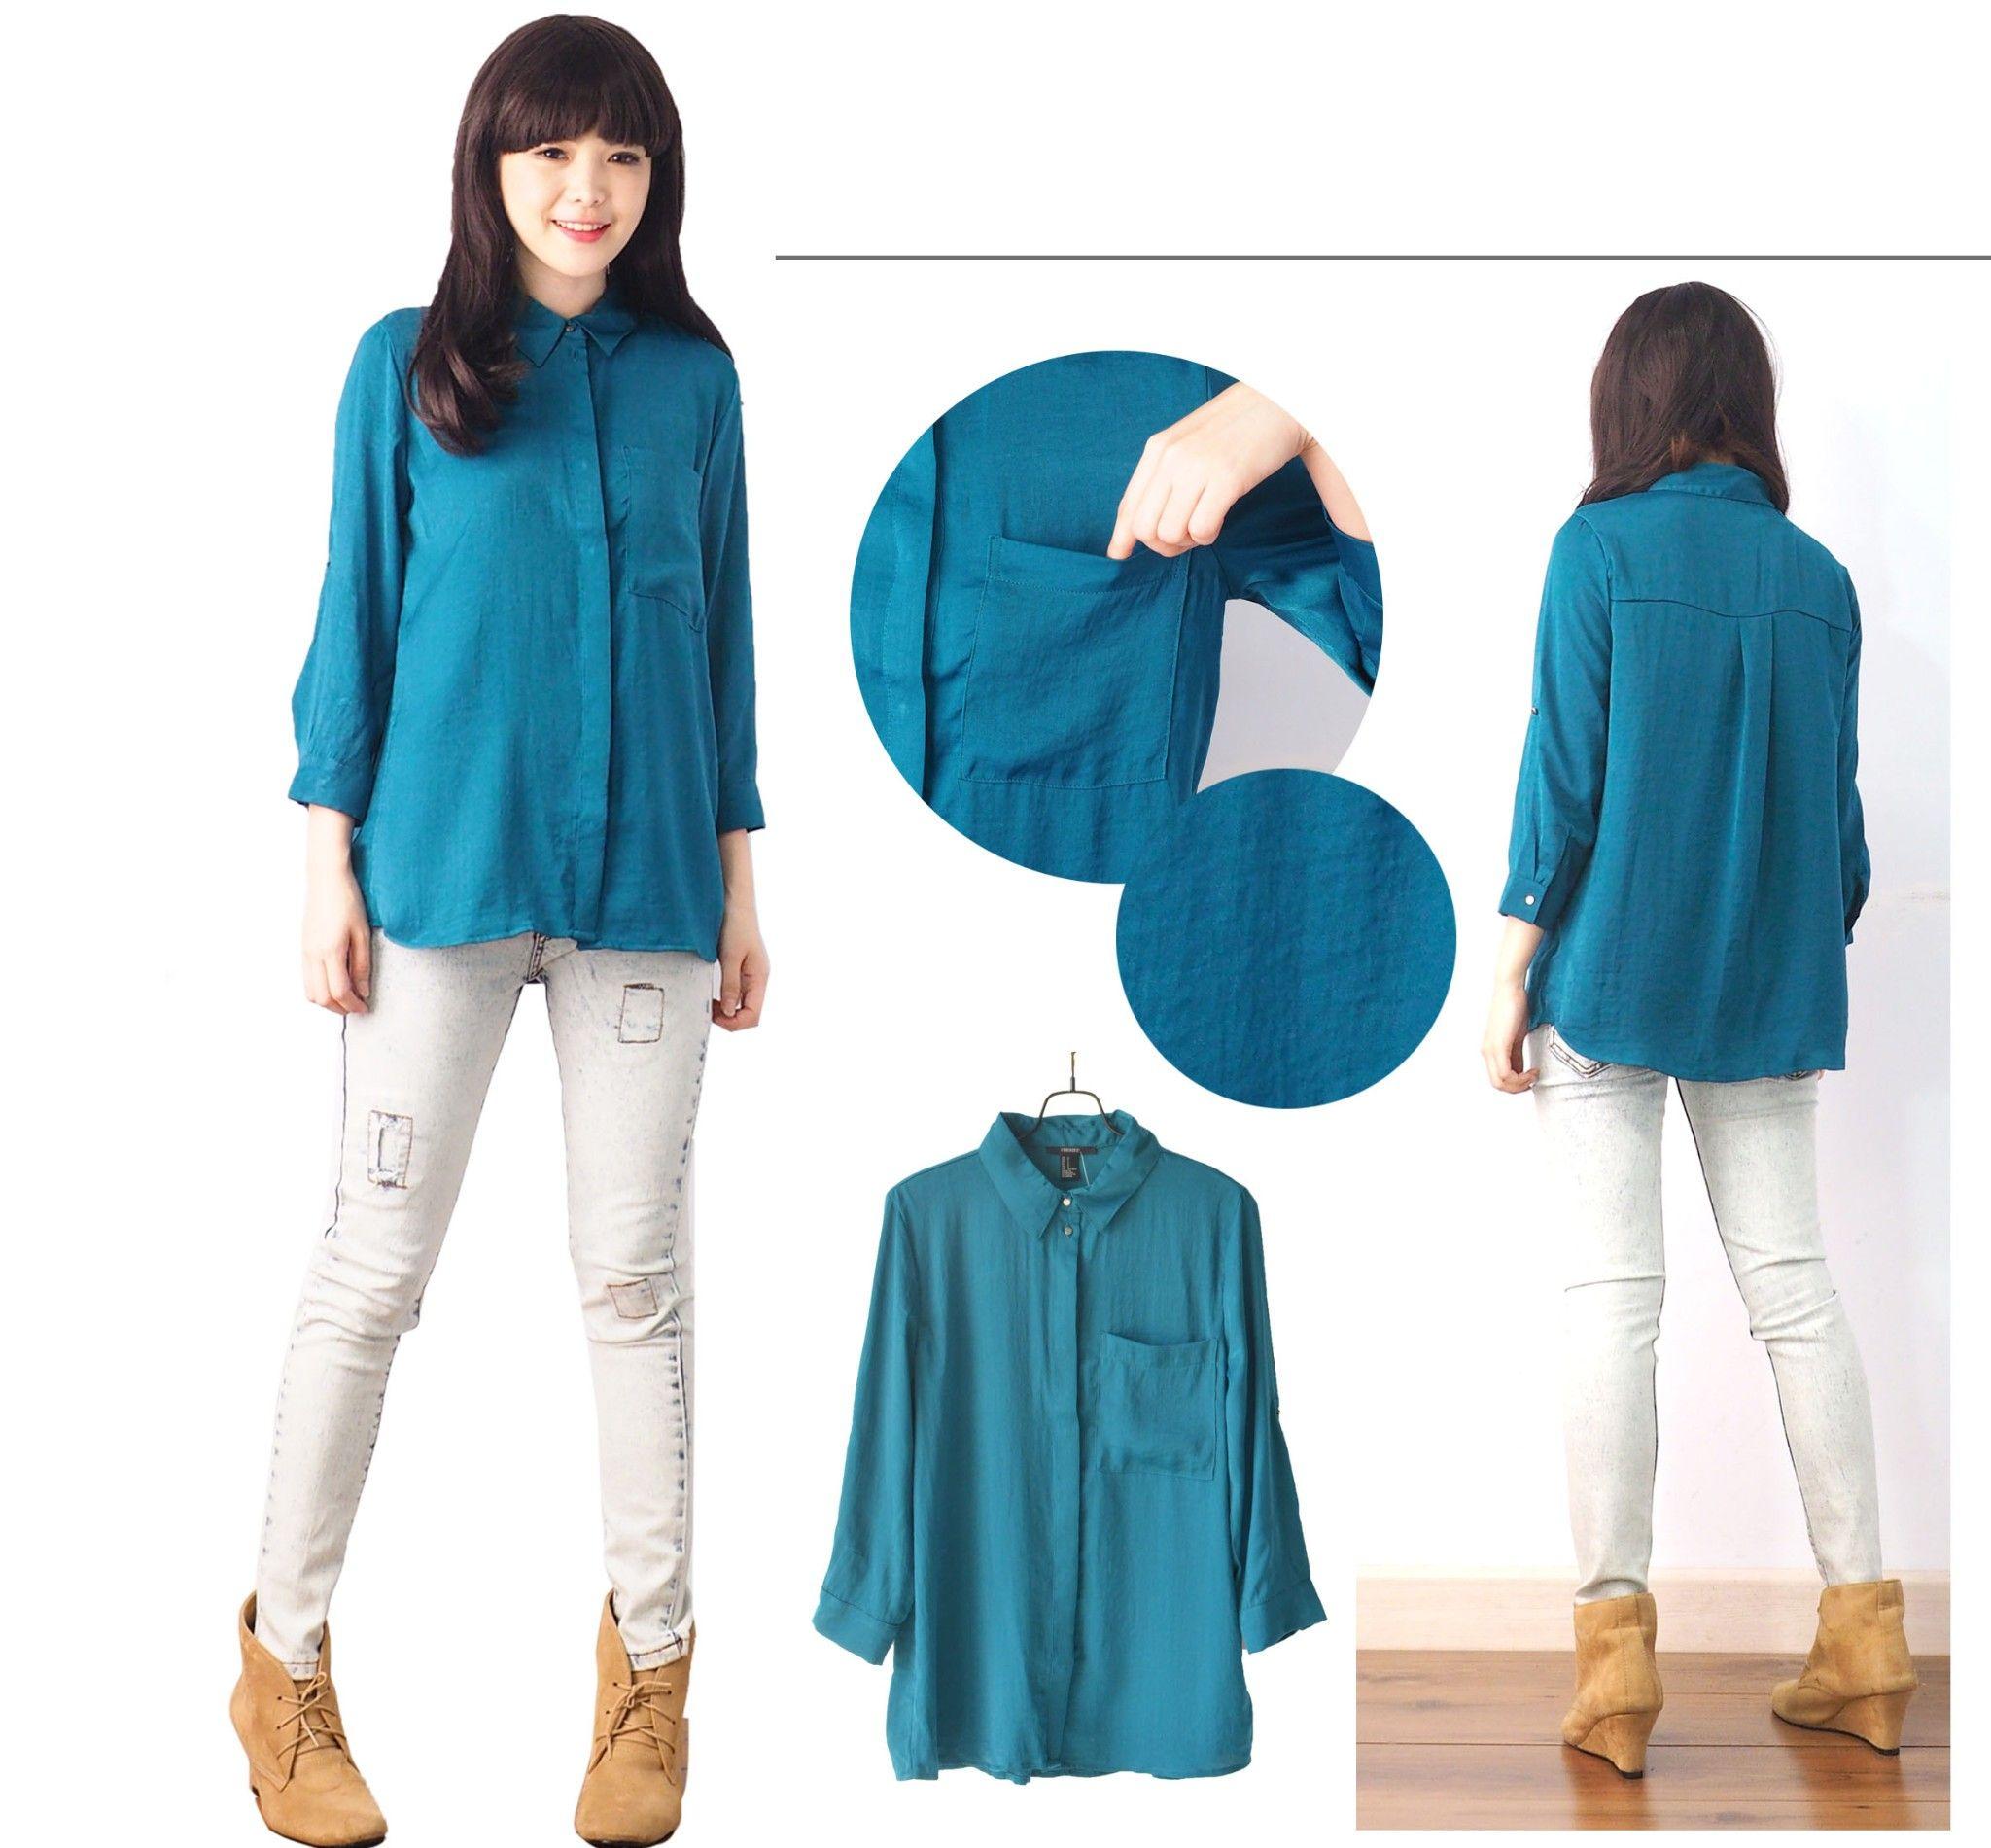 blouse imuslimi imodeli pakaian iwanitai terbaru pakaian bayi